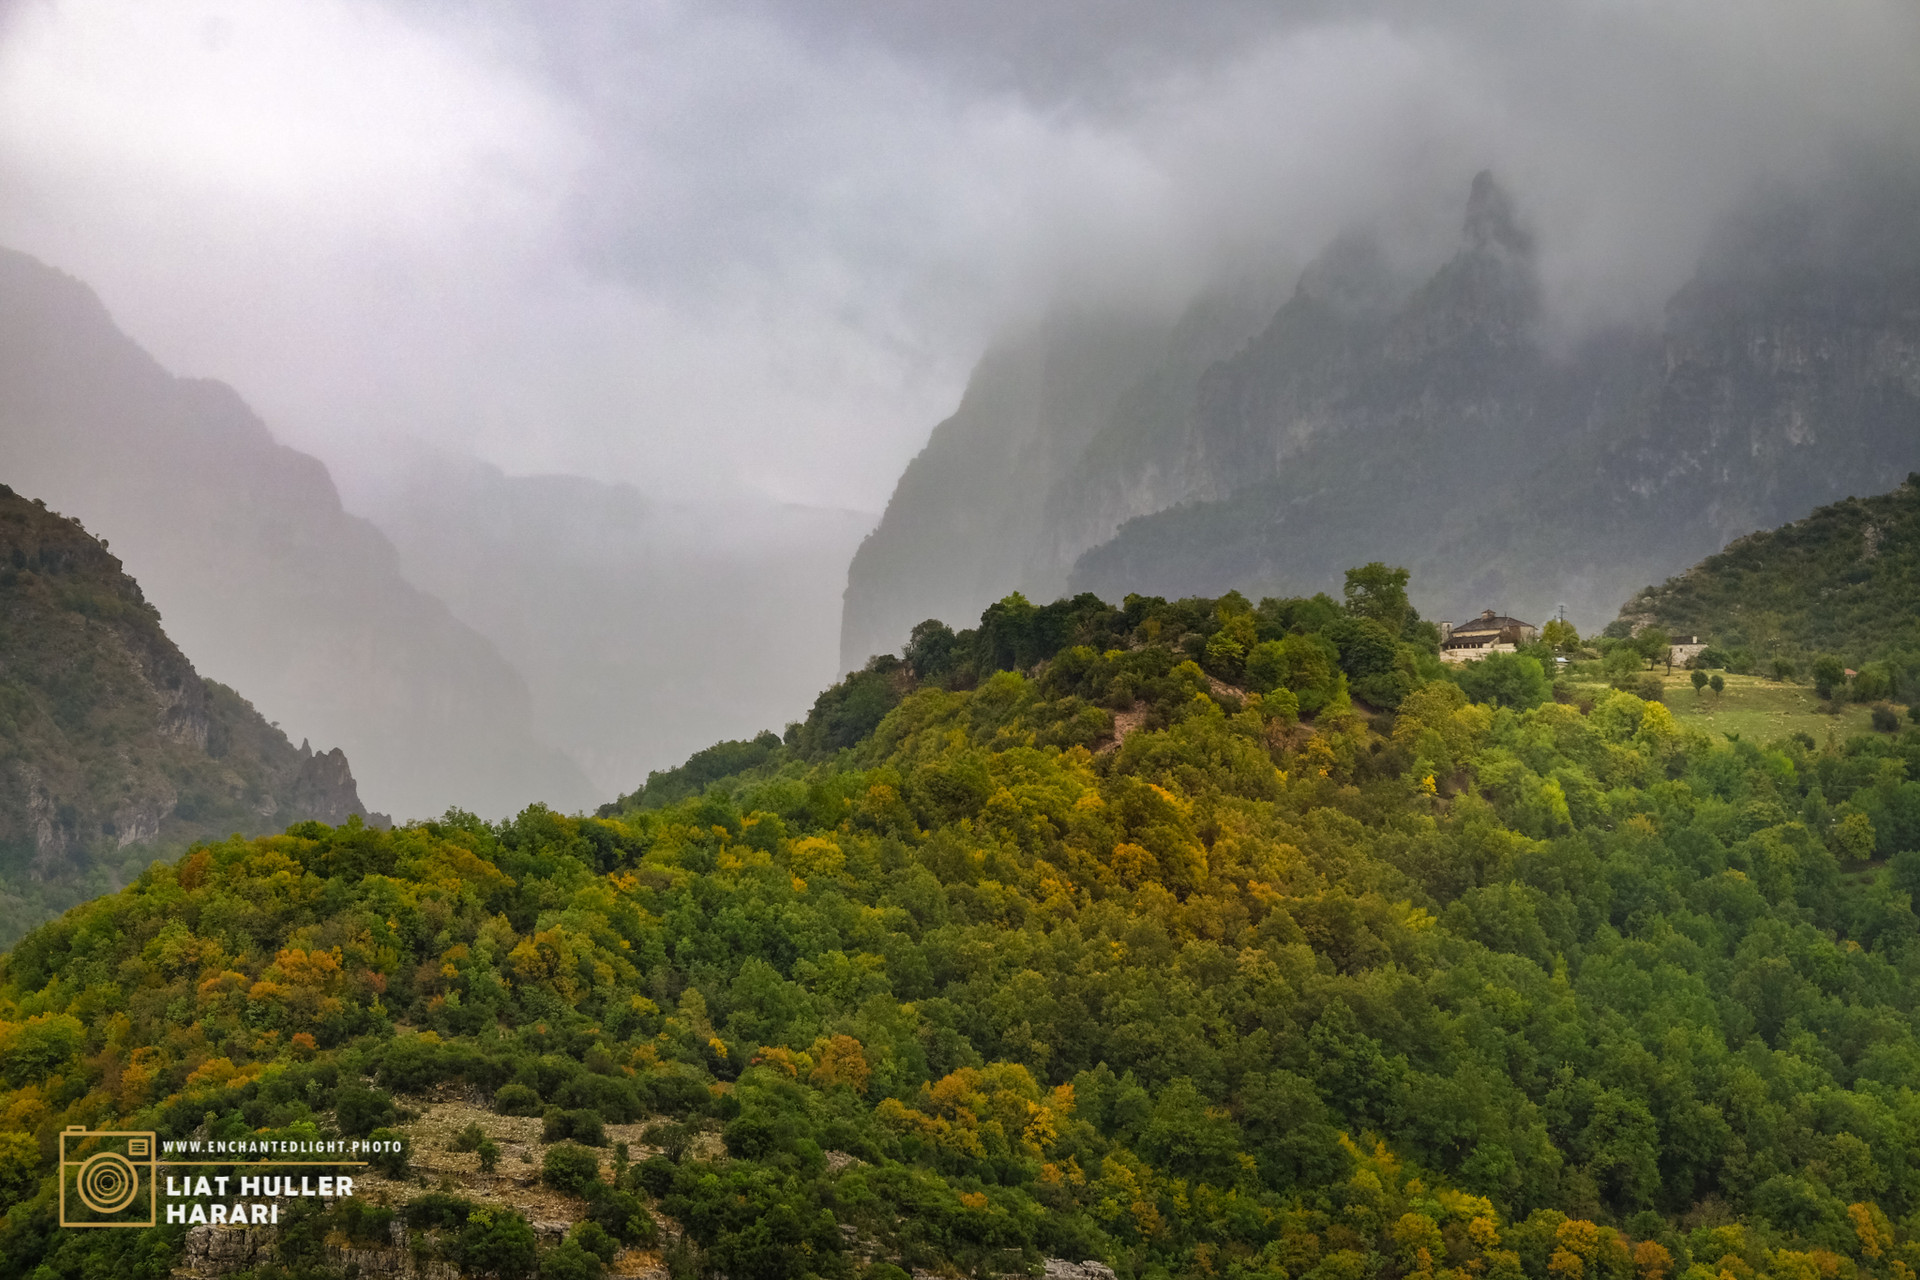 a foggy mornning in zagori mauntains, greece